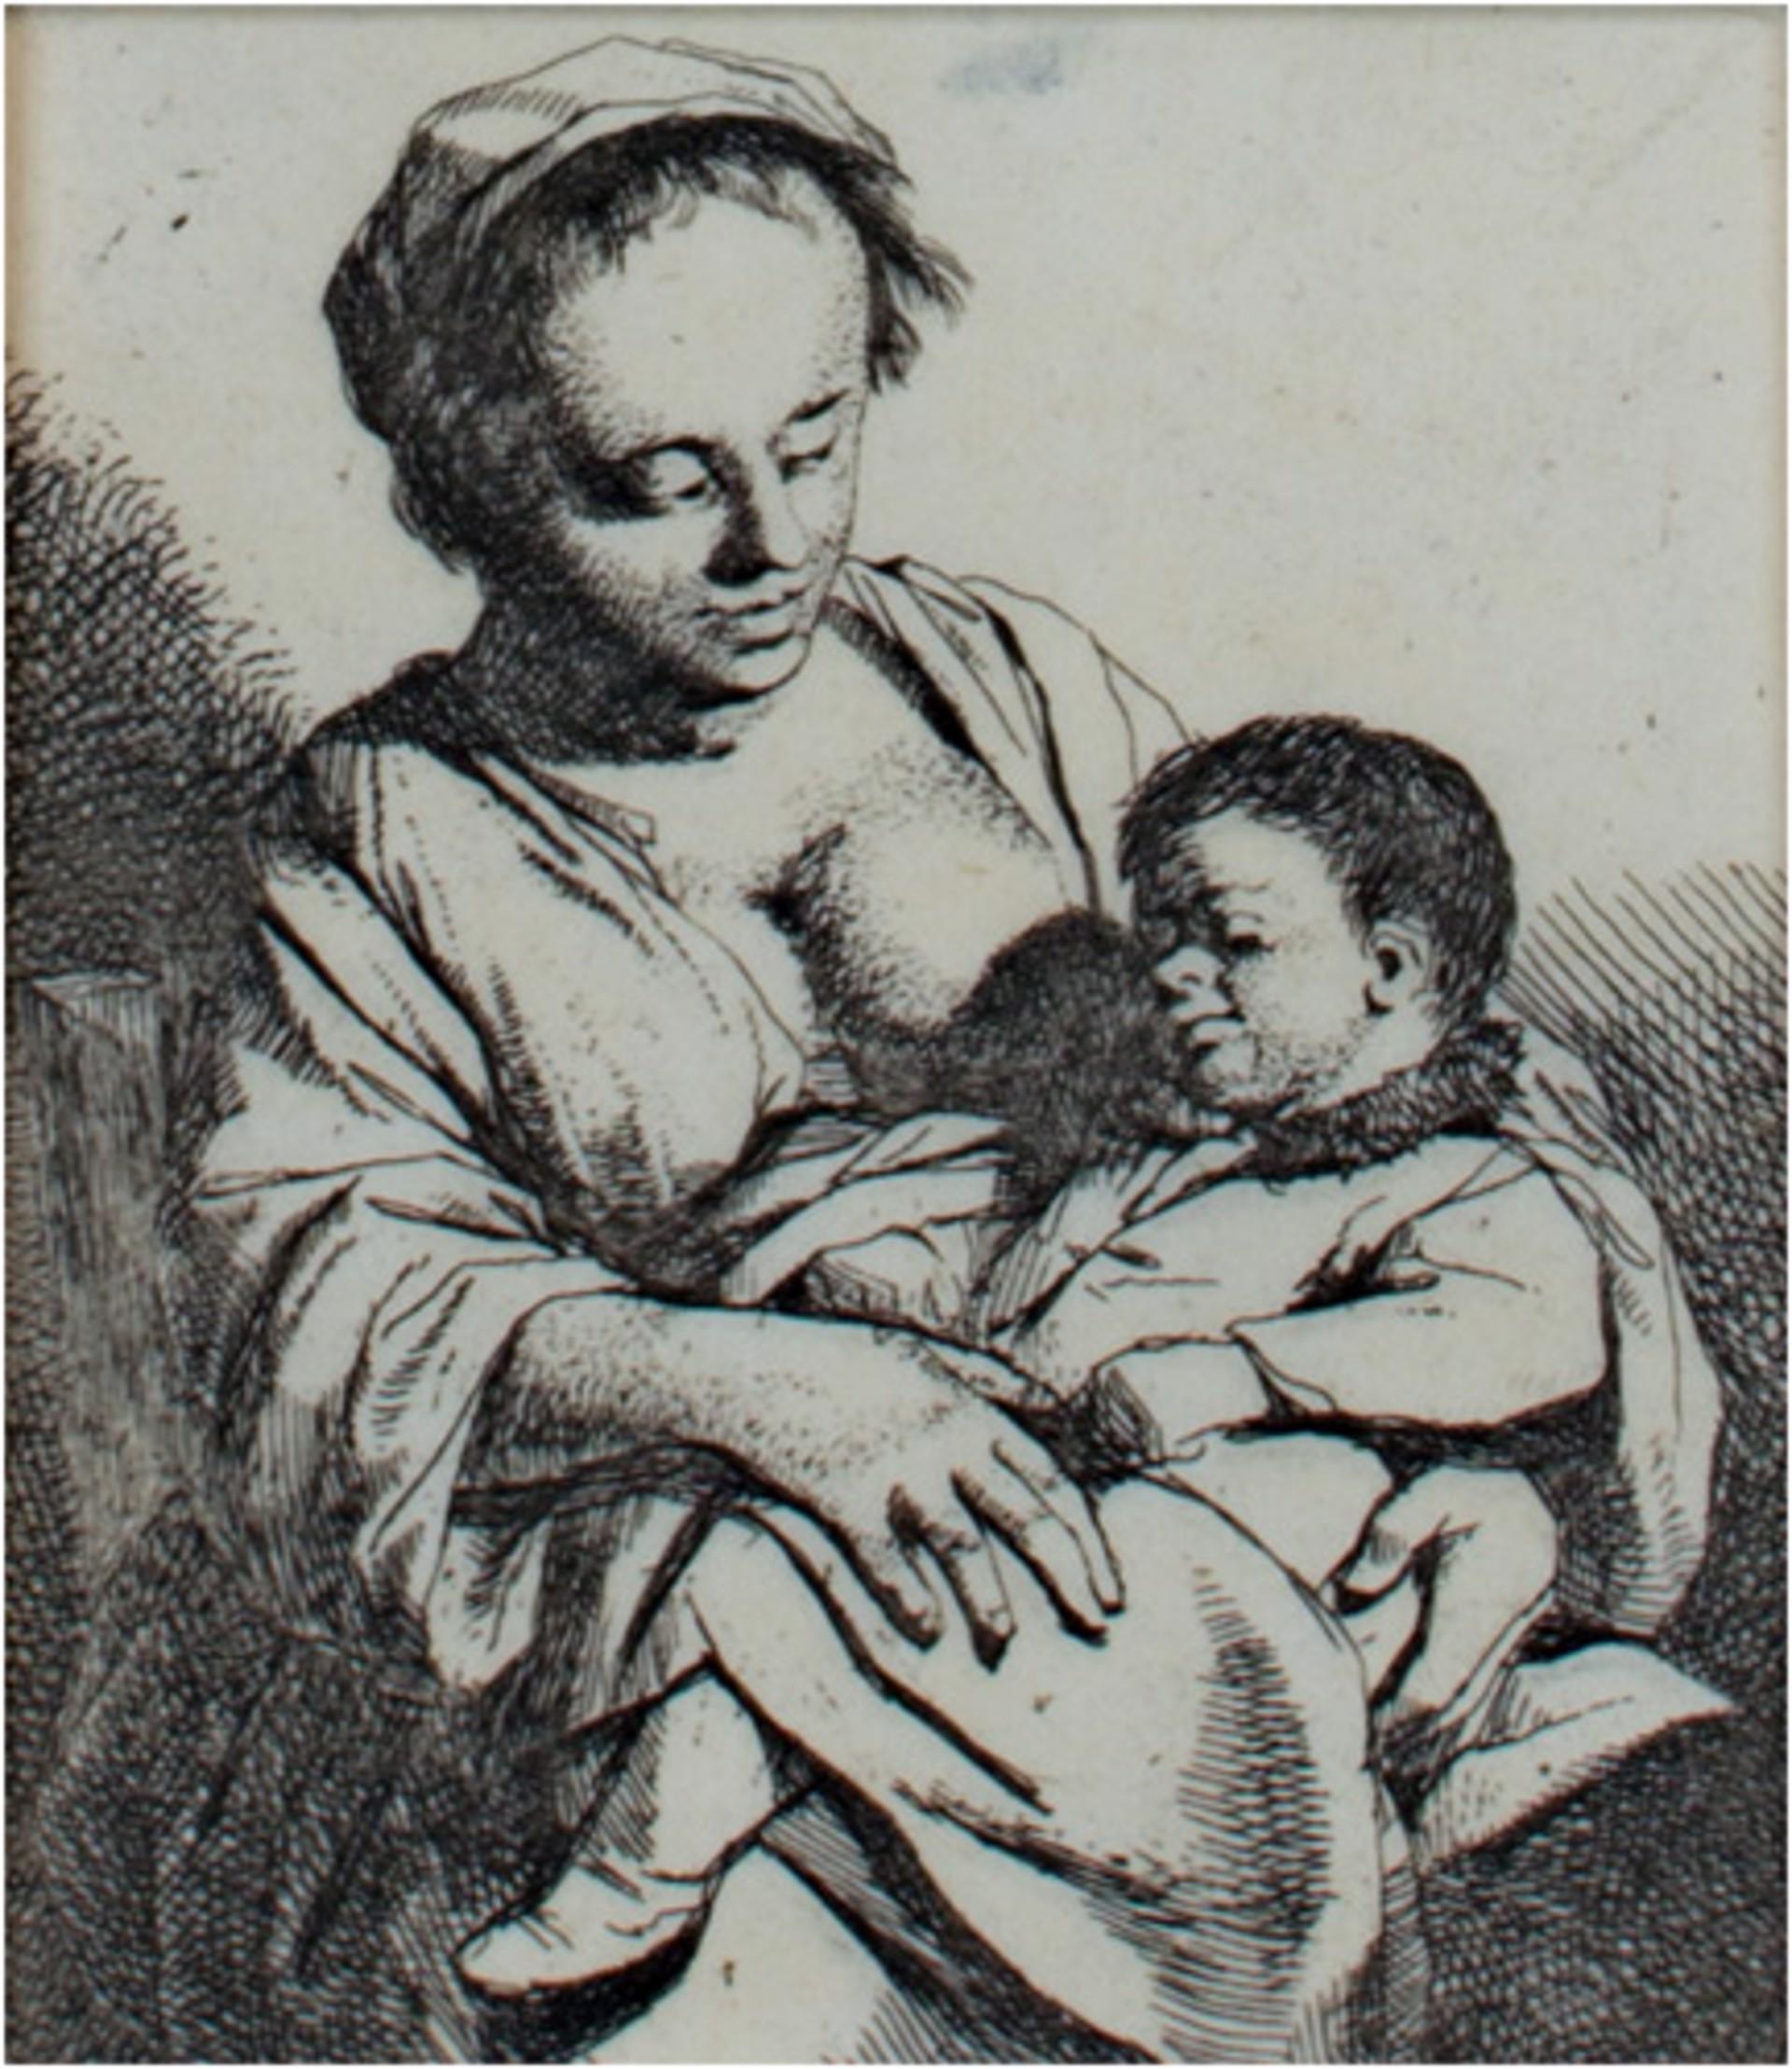 Mother & Child by Cornelis-Pietersz Bega